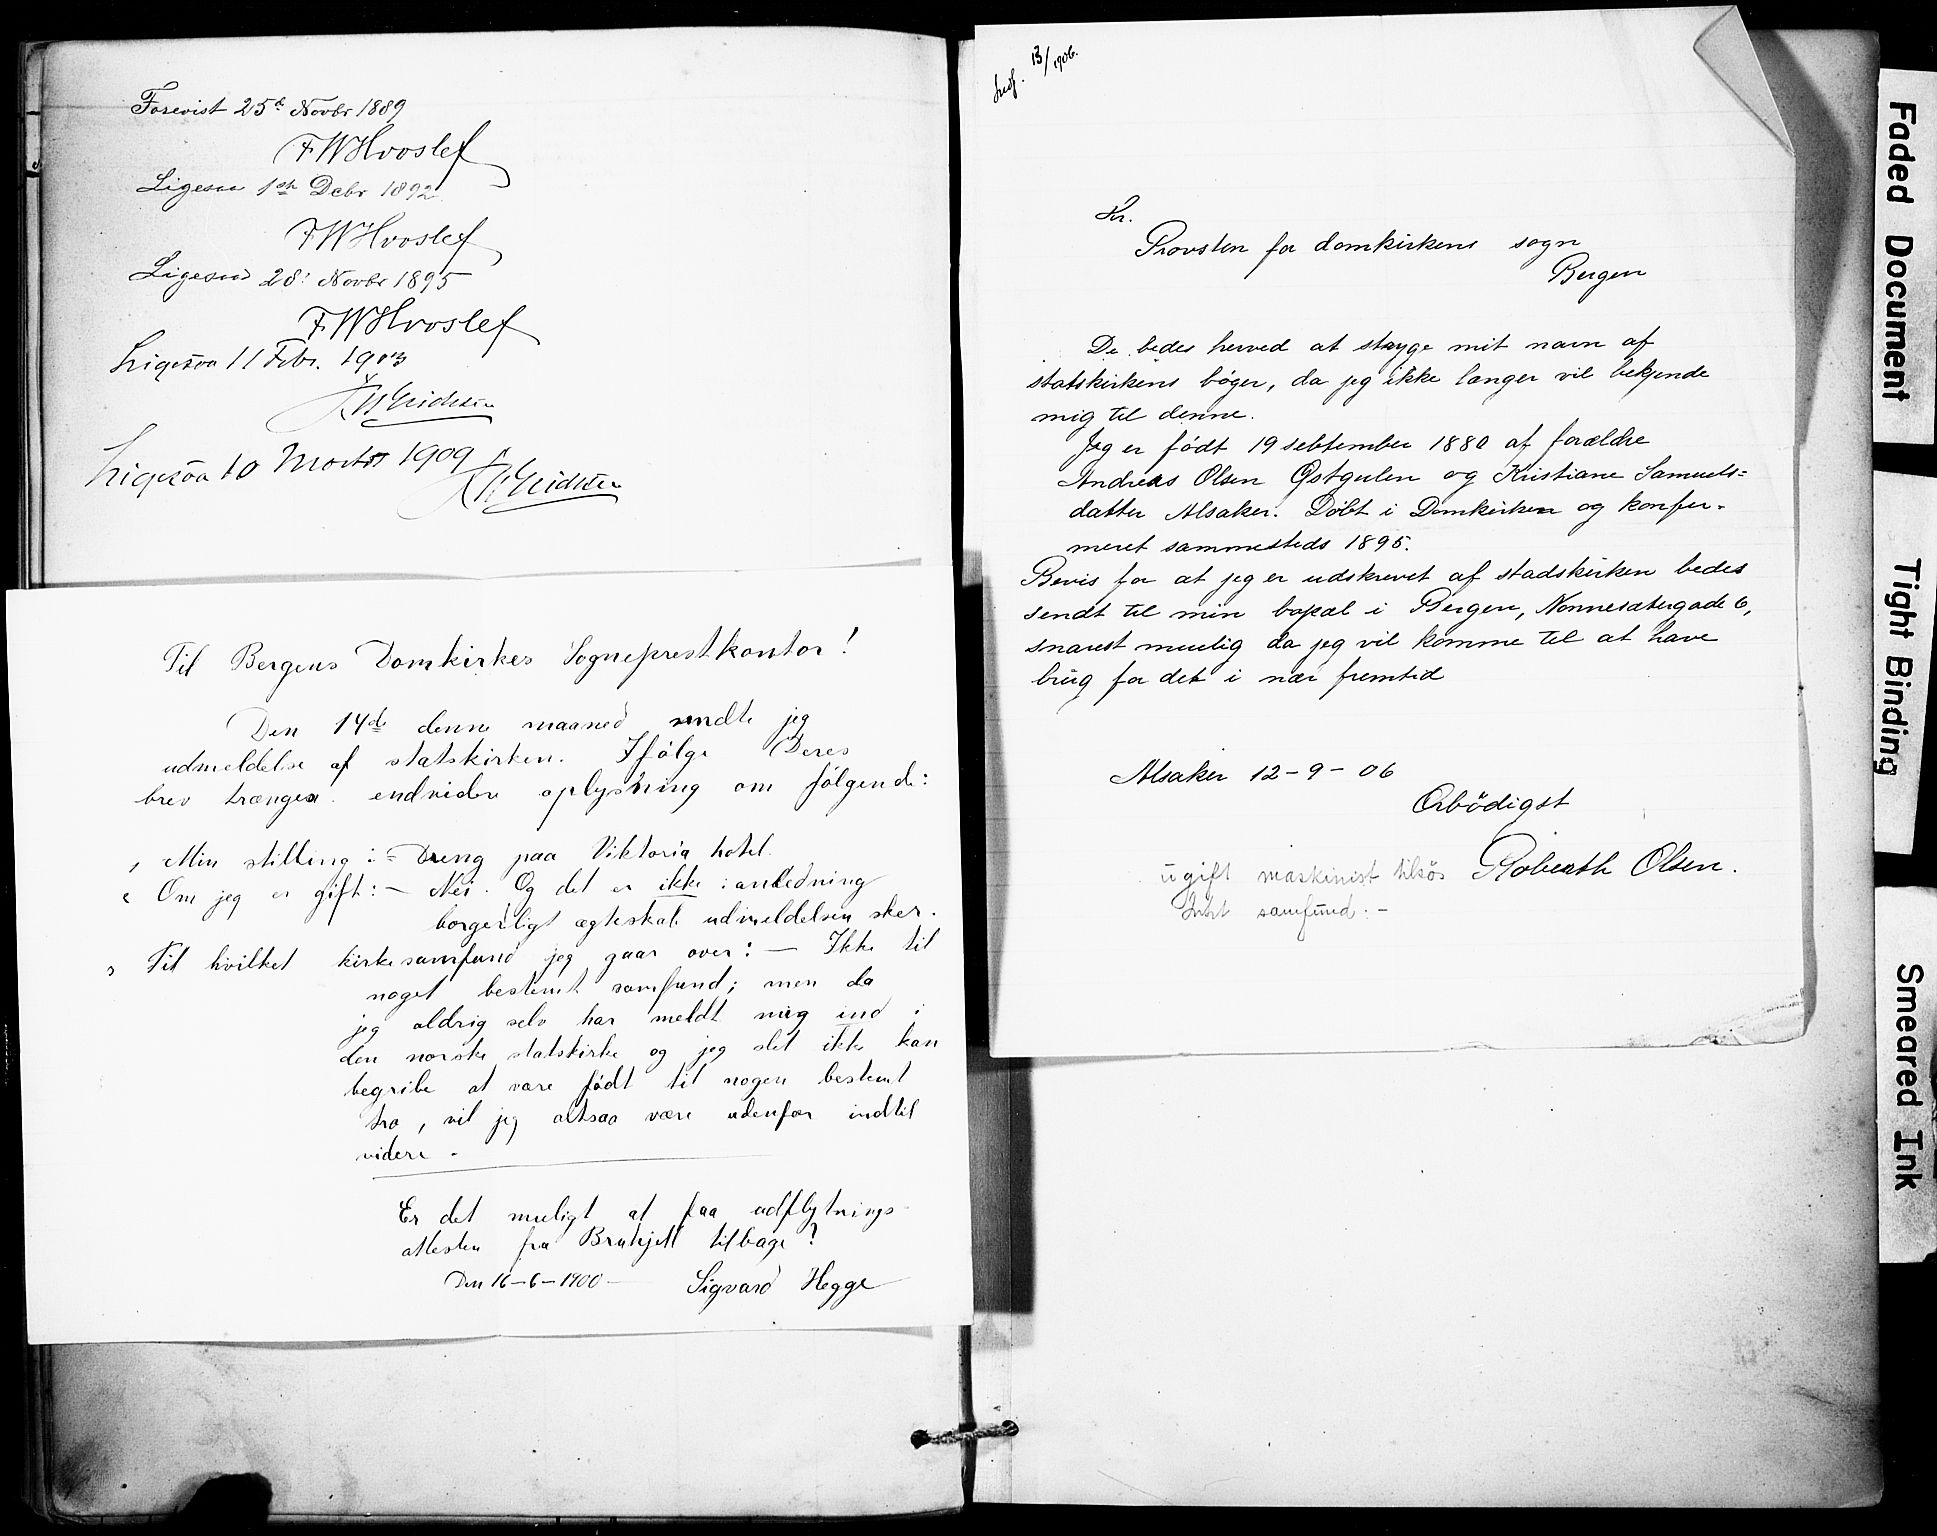 SAB, Domkirken Sokneprestembete, H/Haa: Ministerialbok nr. I 1, 1887-1908